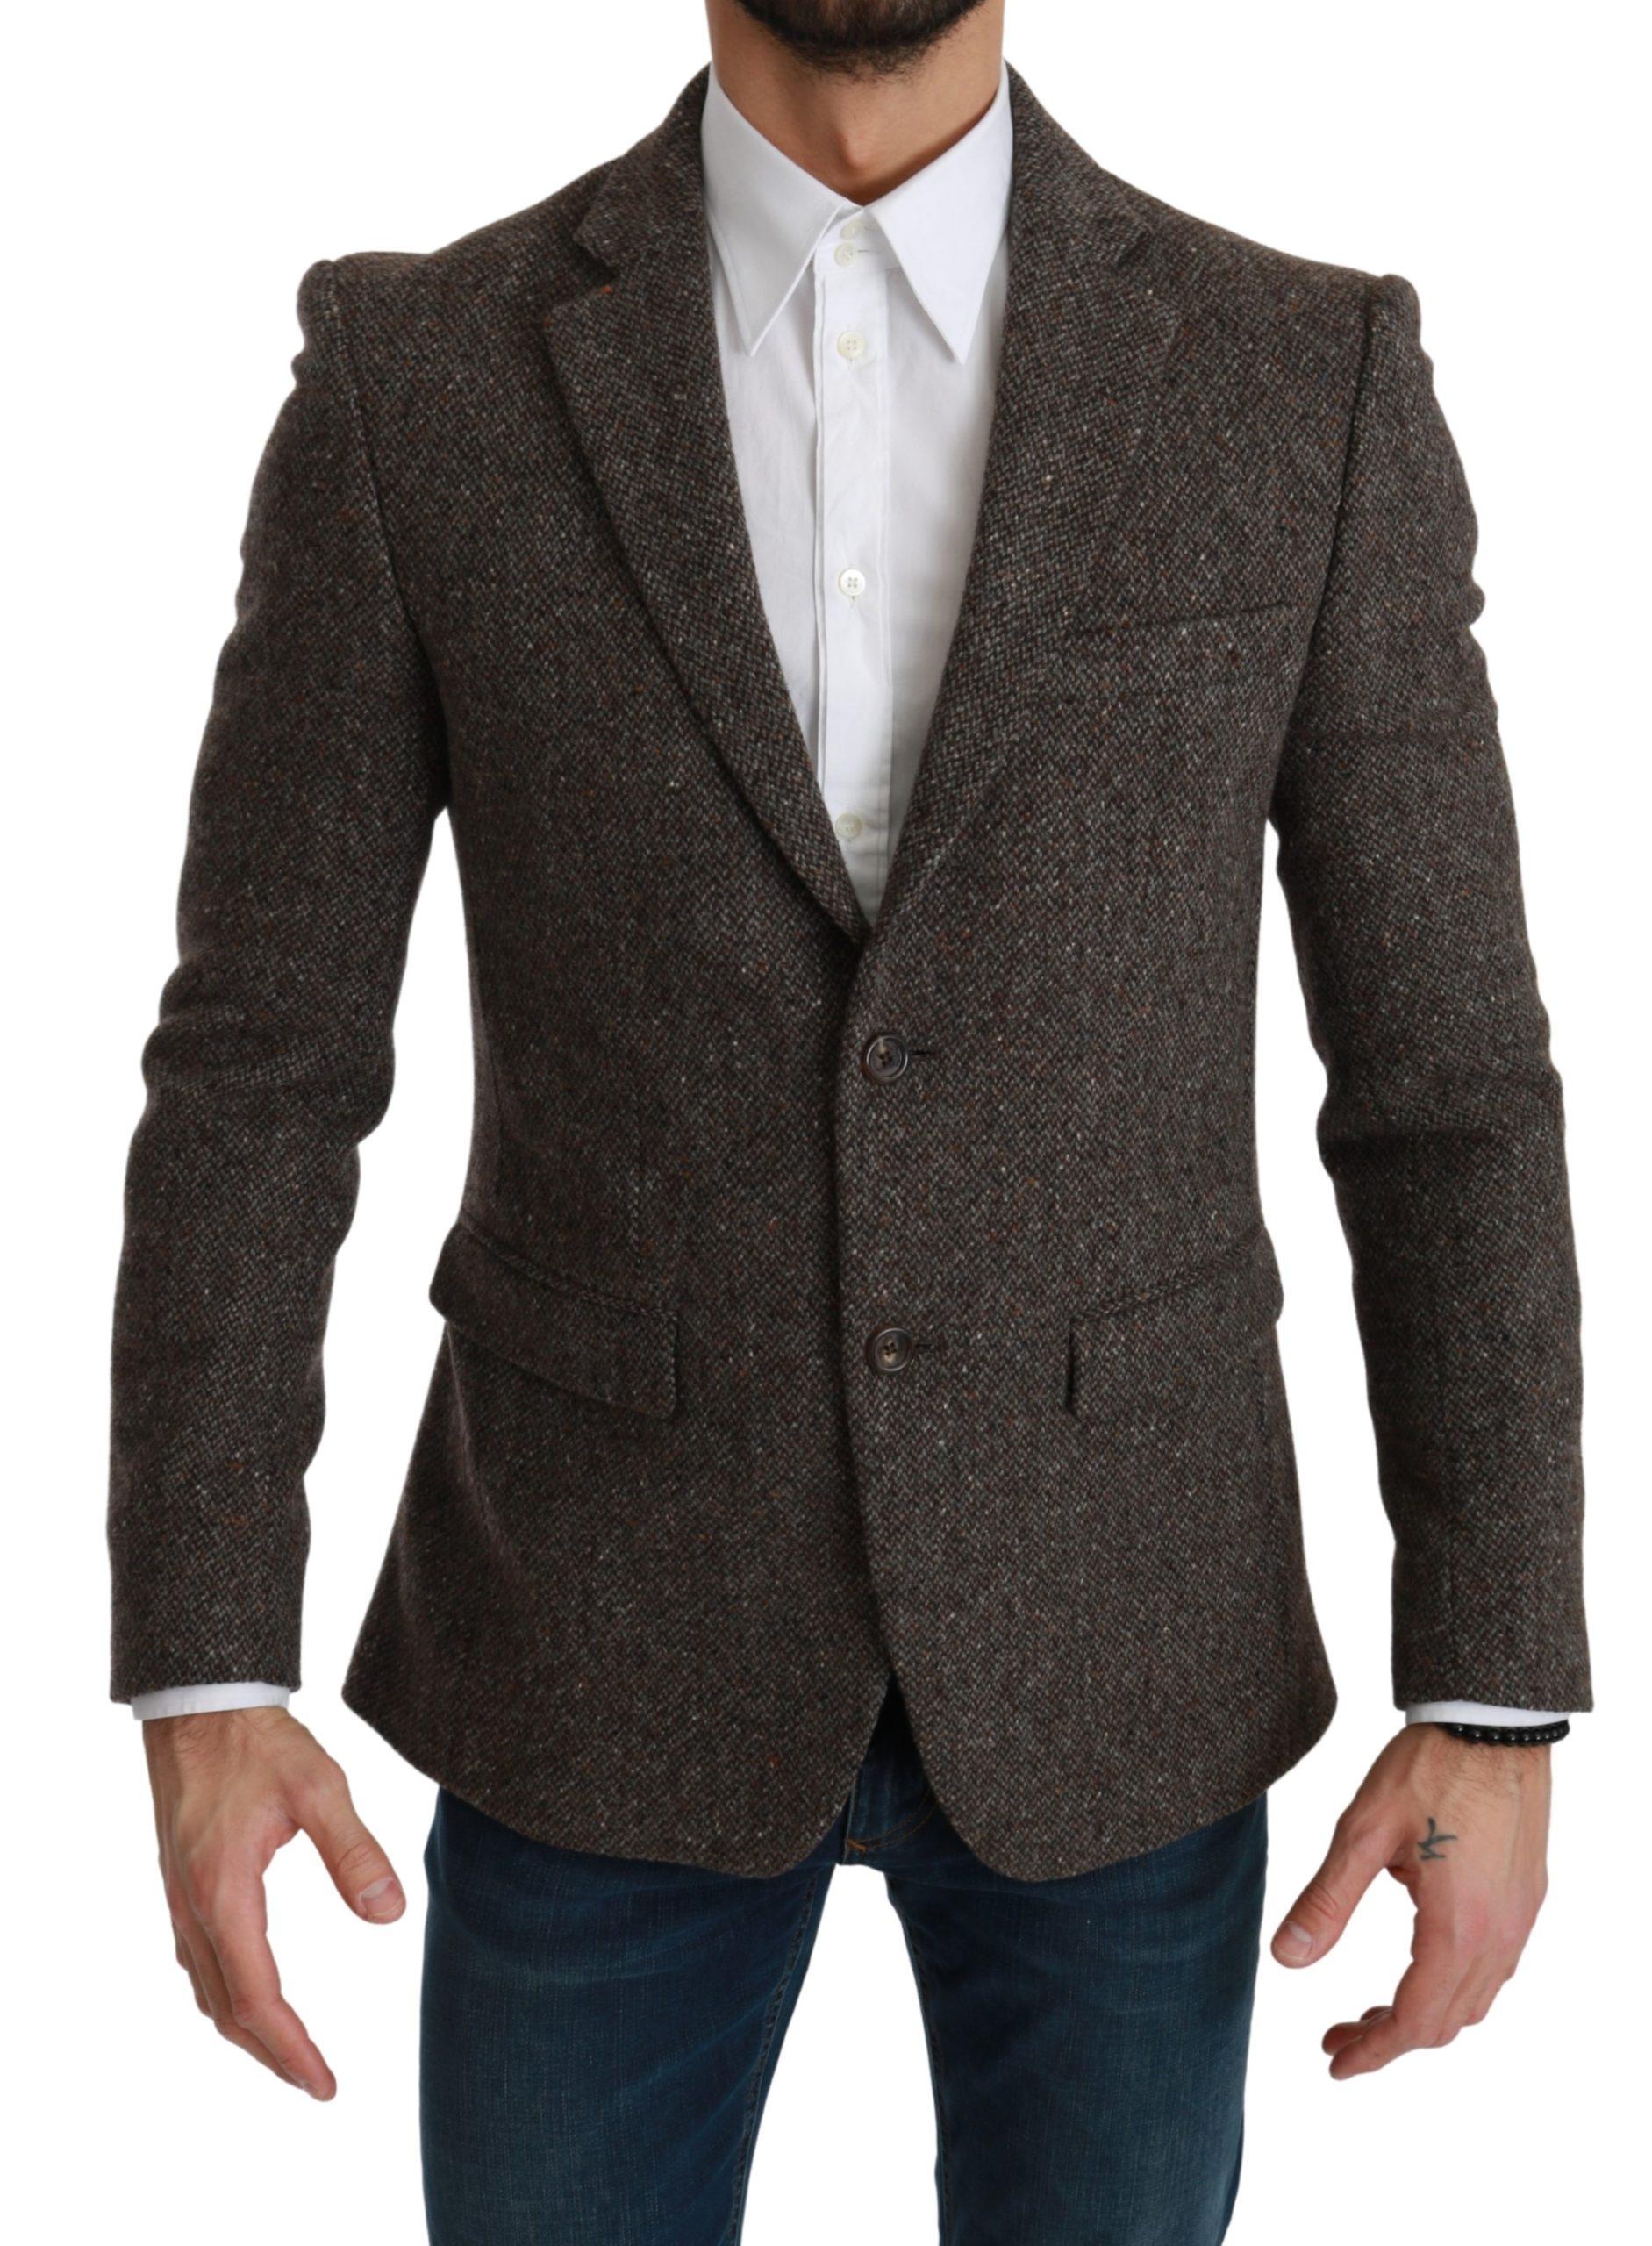 Dolce & Gabbana Men's Formal Coat Wool Blazer Brown KOS1783 - IT48   M